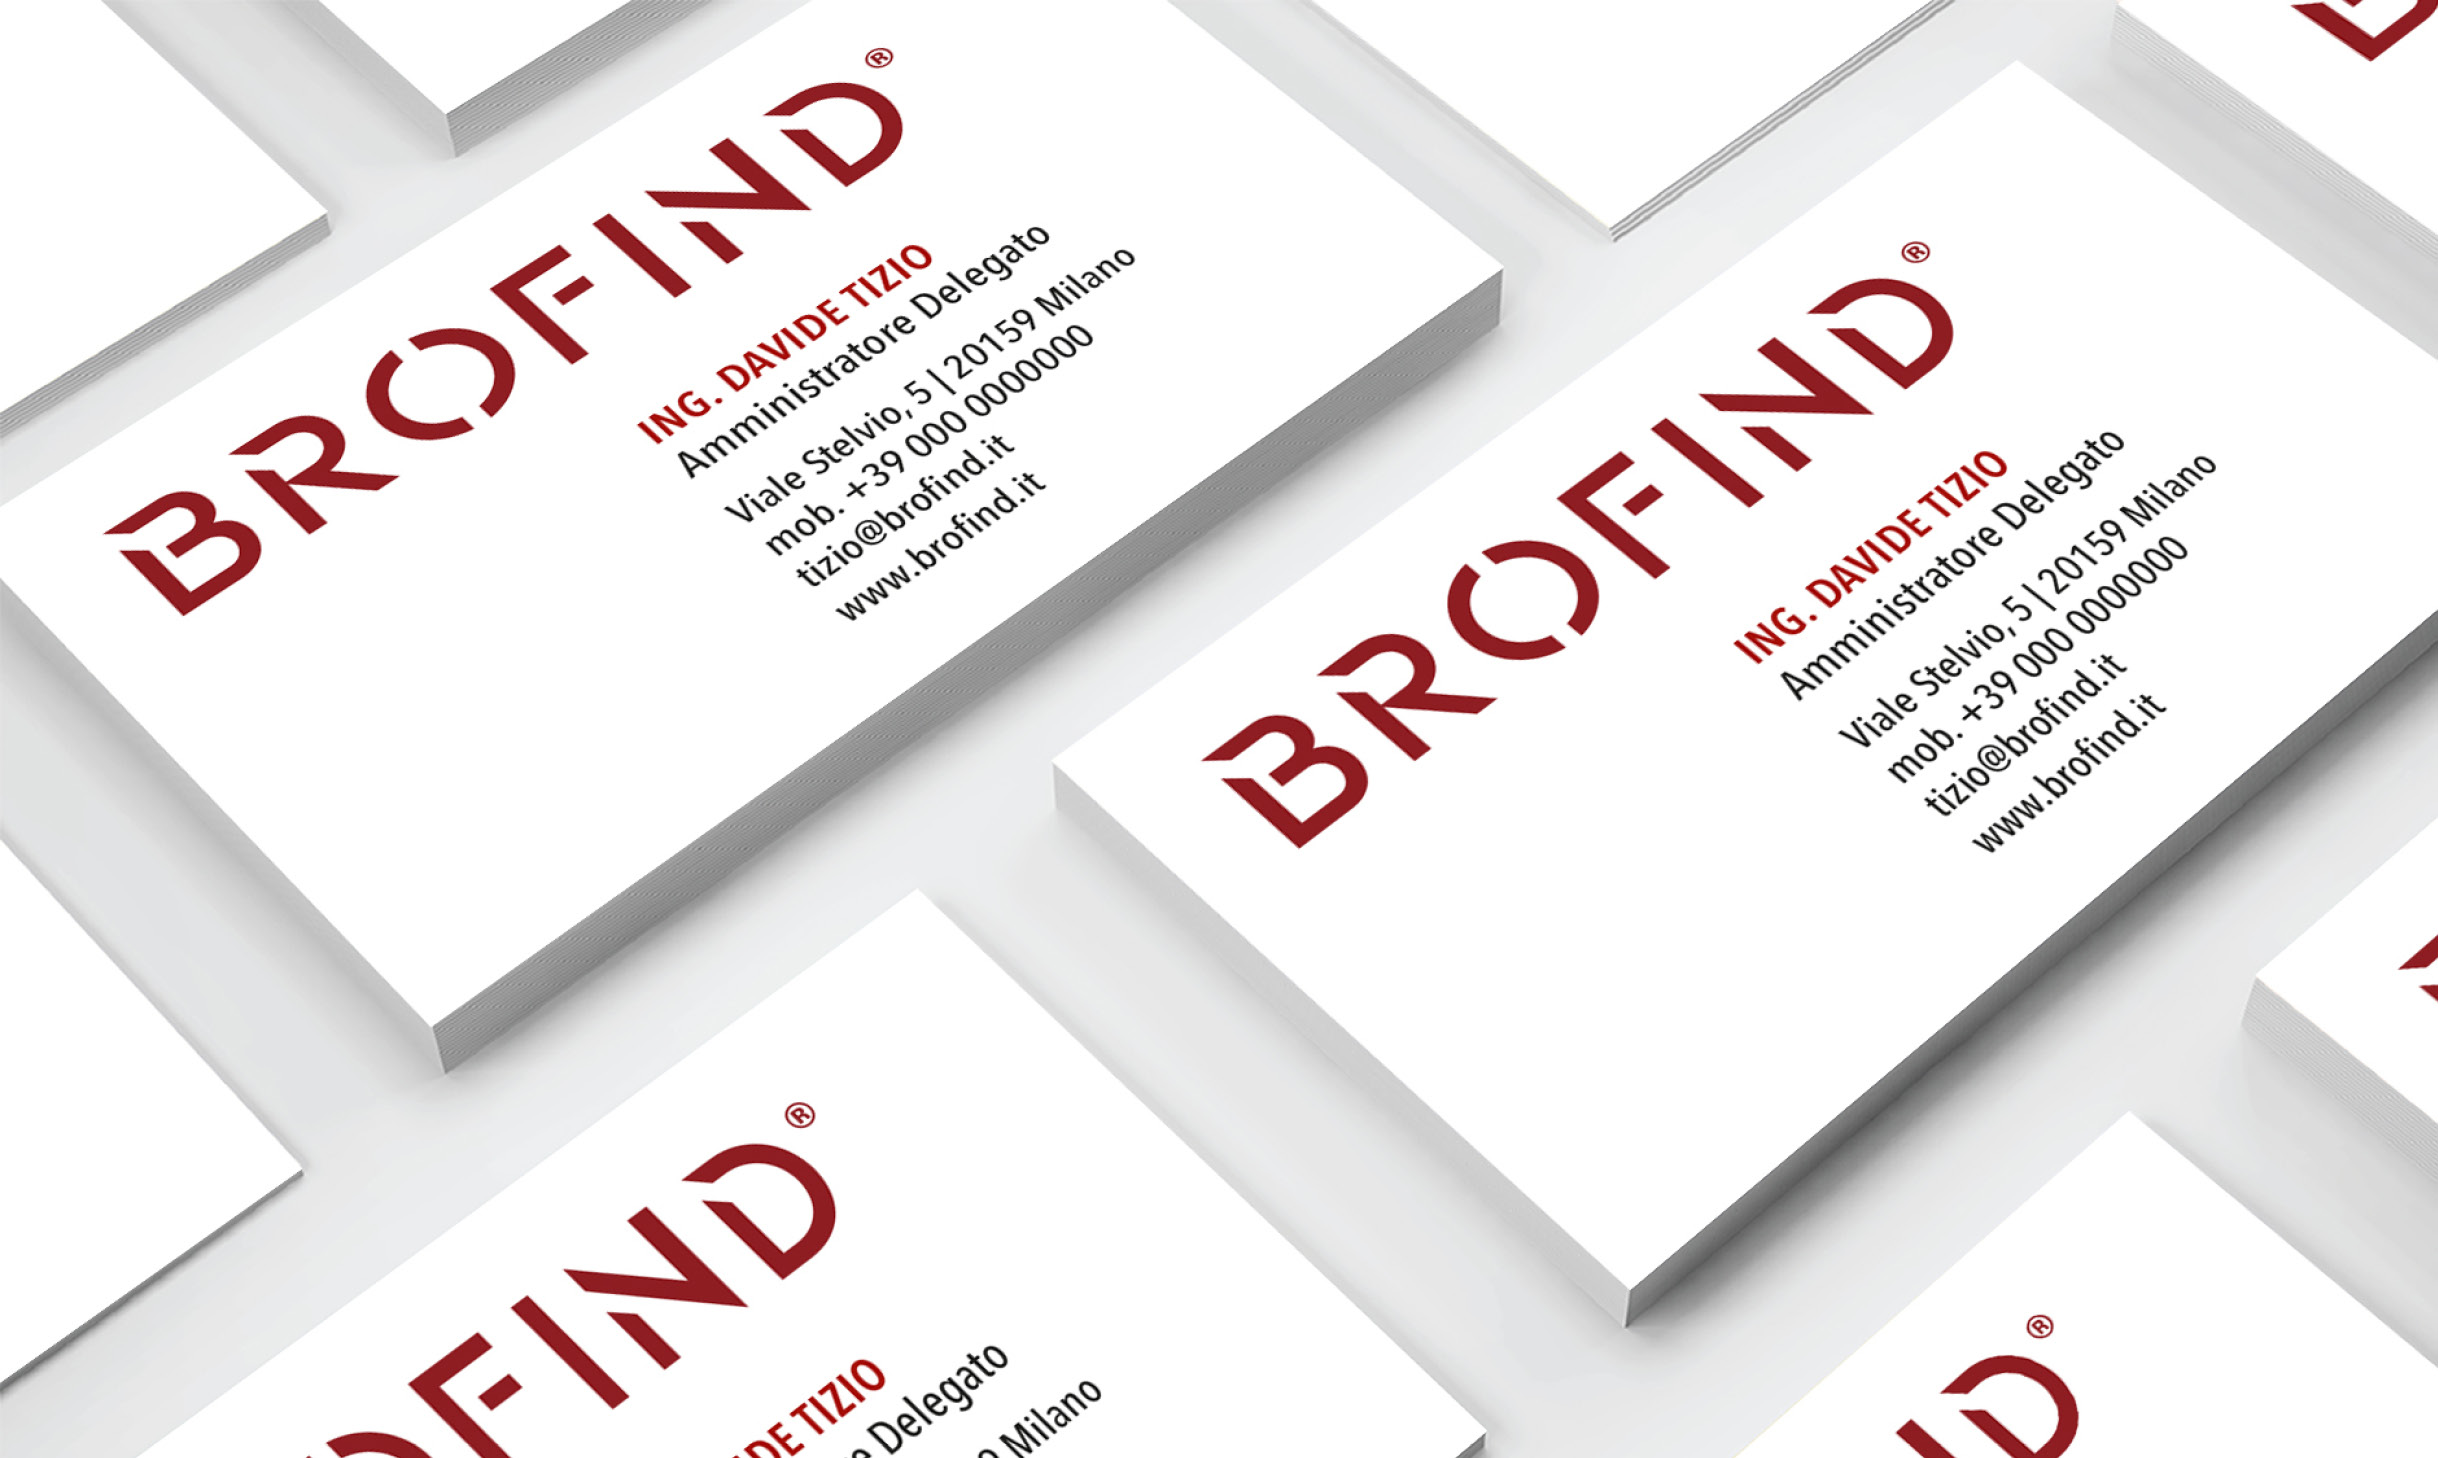 HORAdesign_Brofind_3